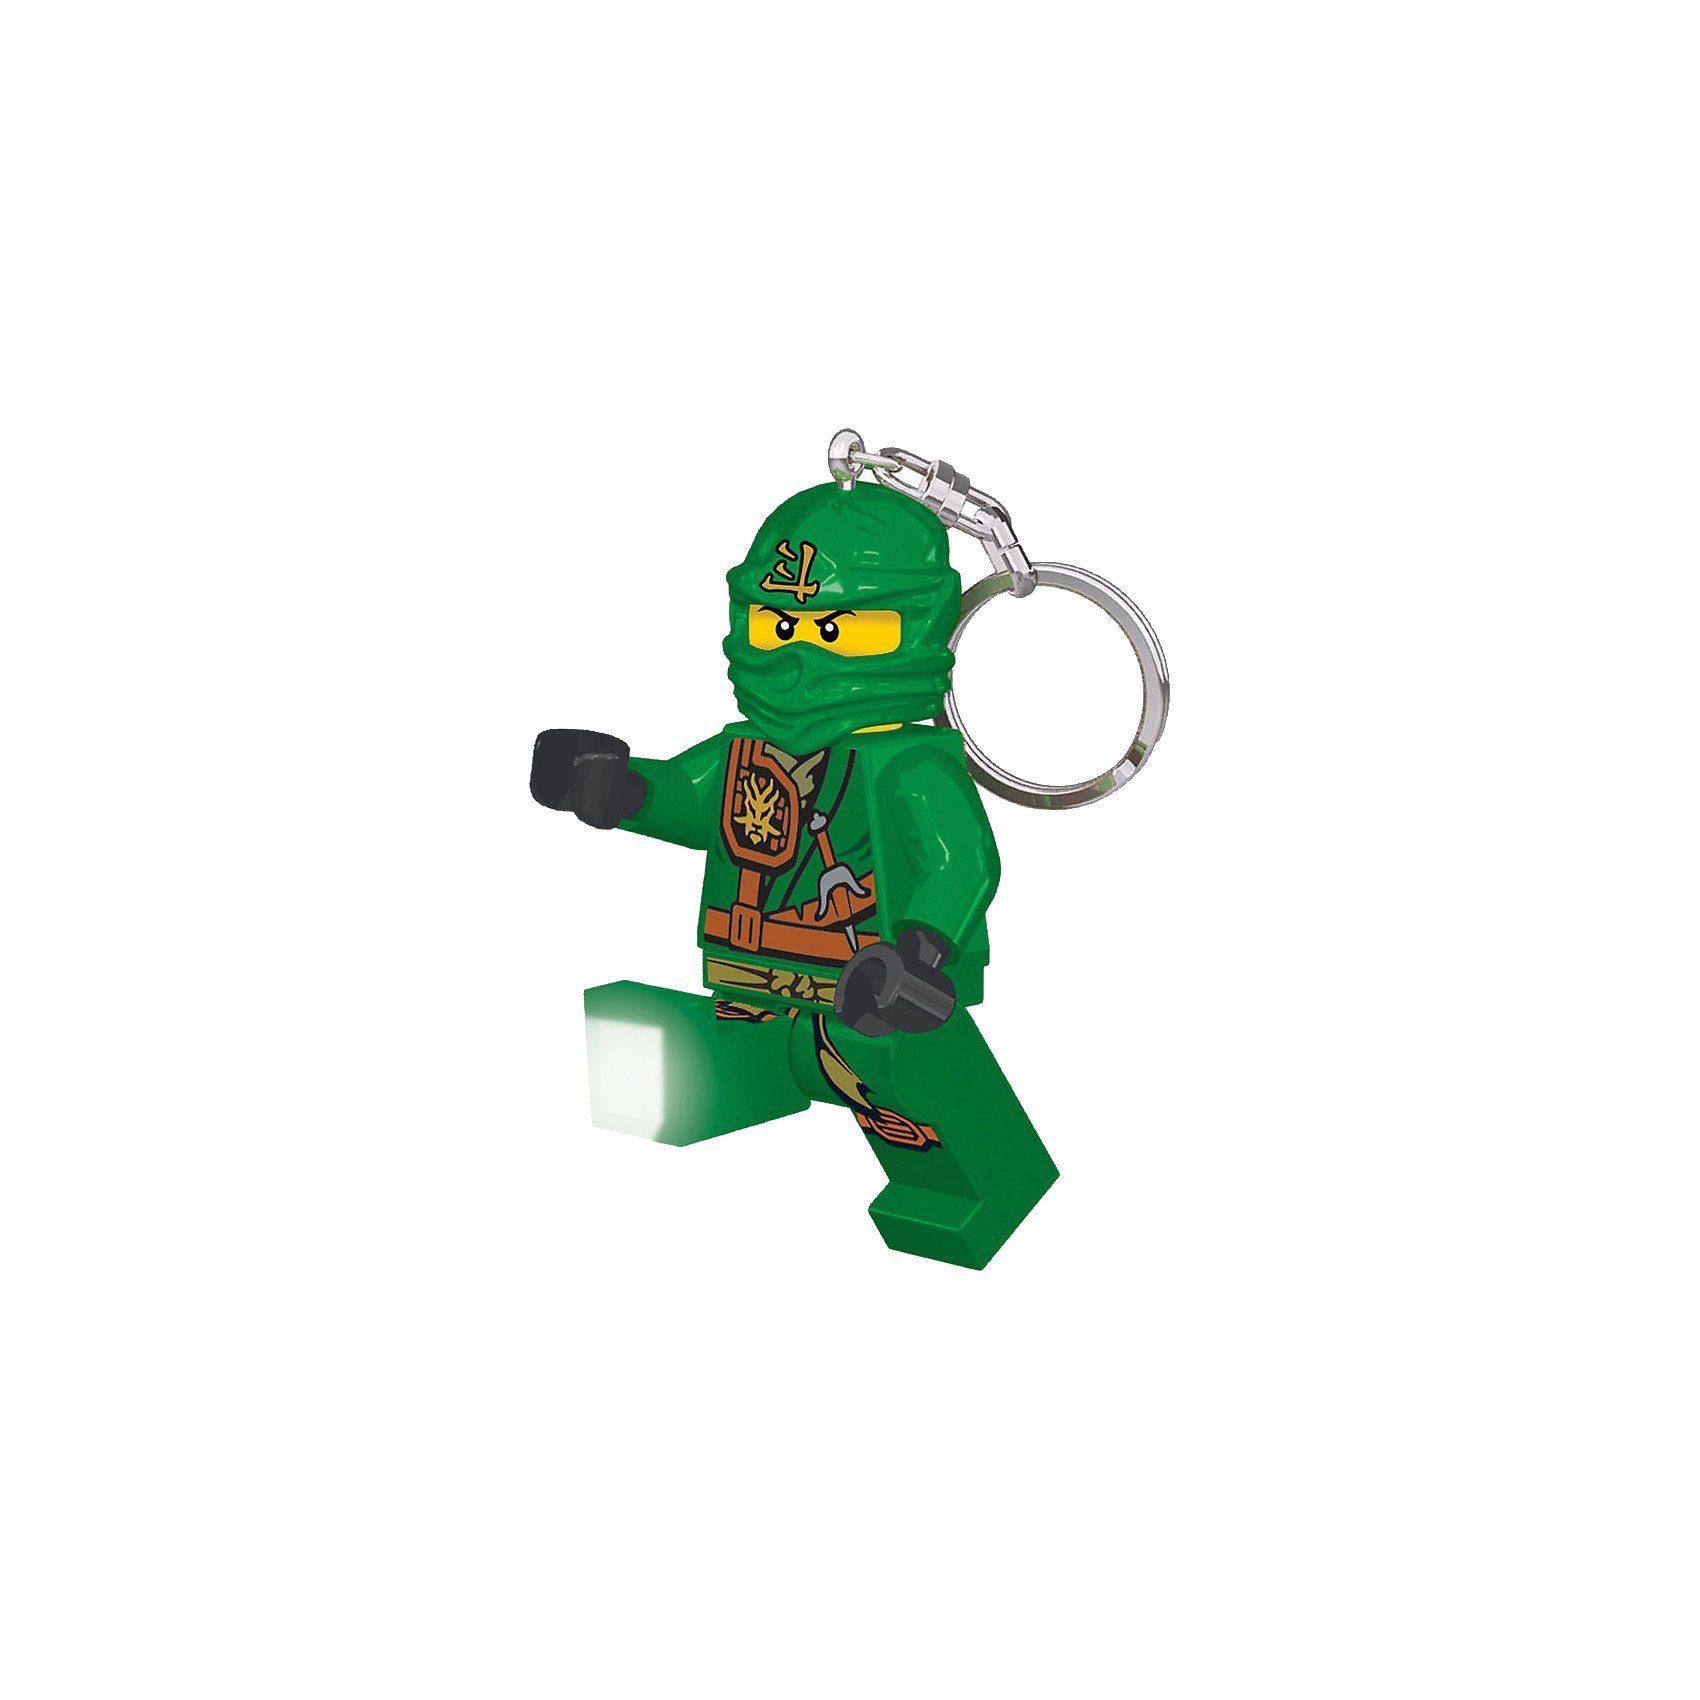 Lego® Ninjago Lloyd (Minitaschenlampe)